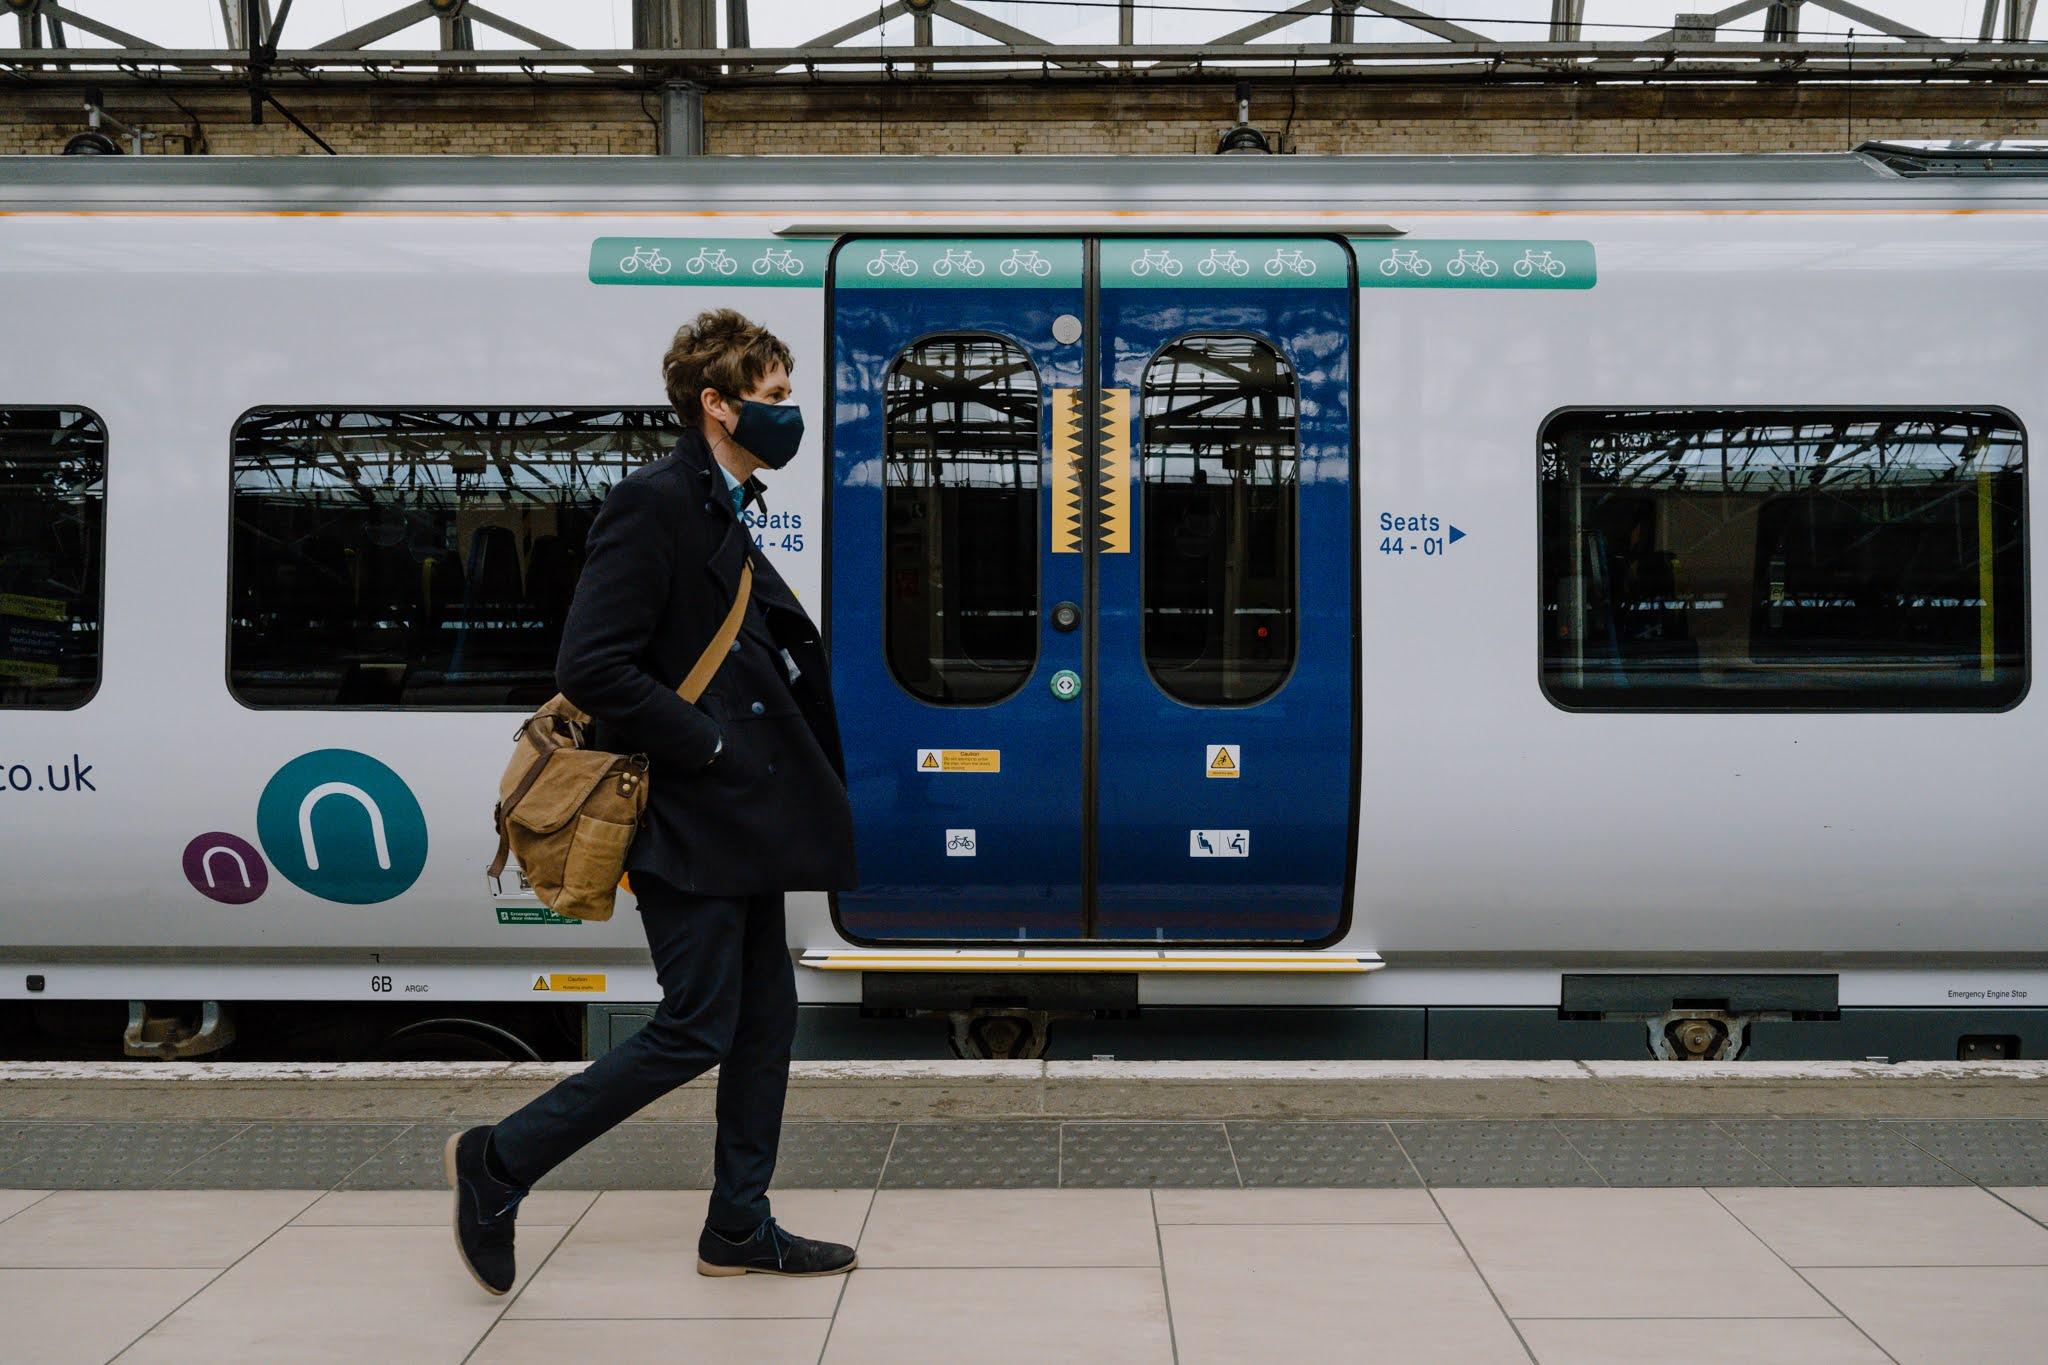 Passenger walking along station platform